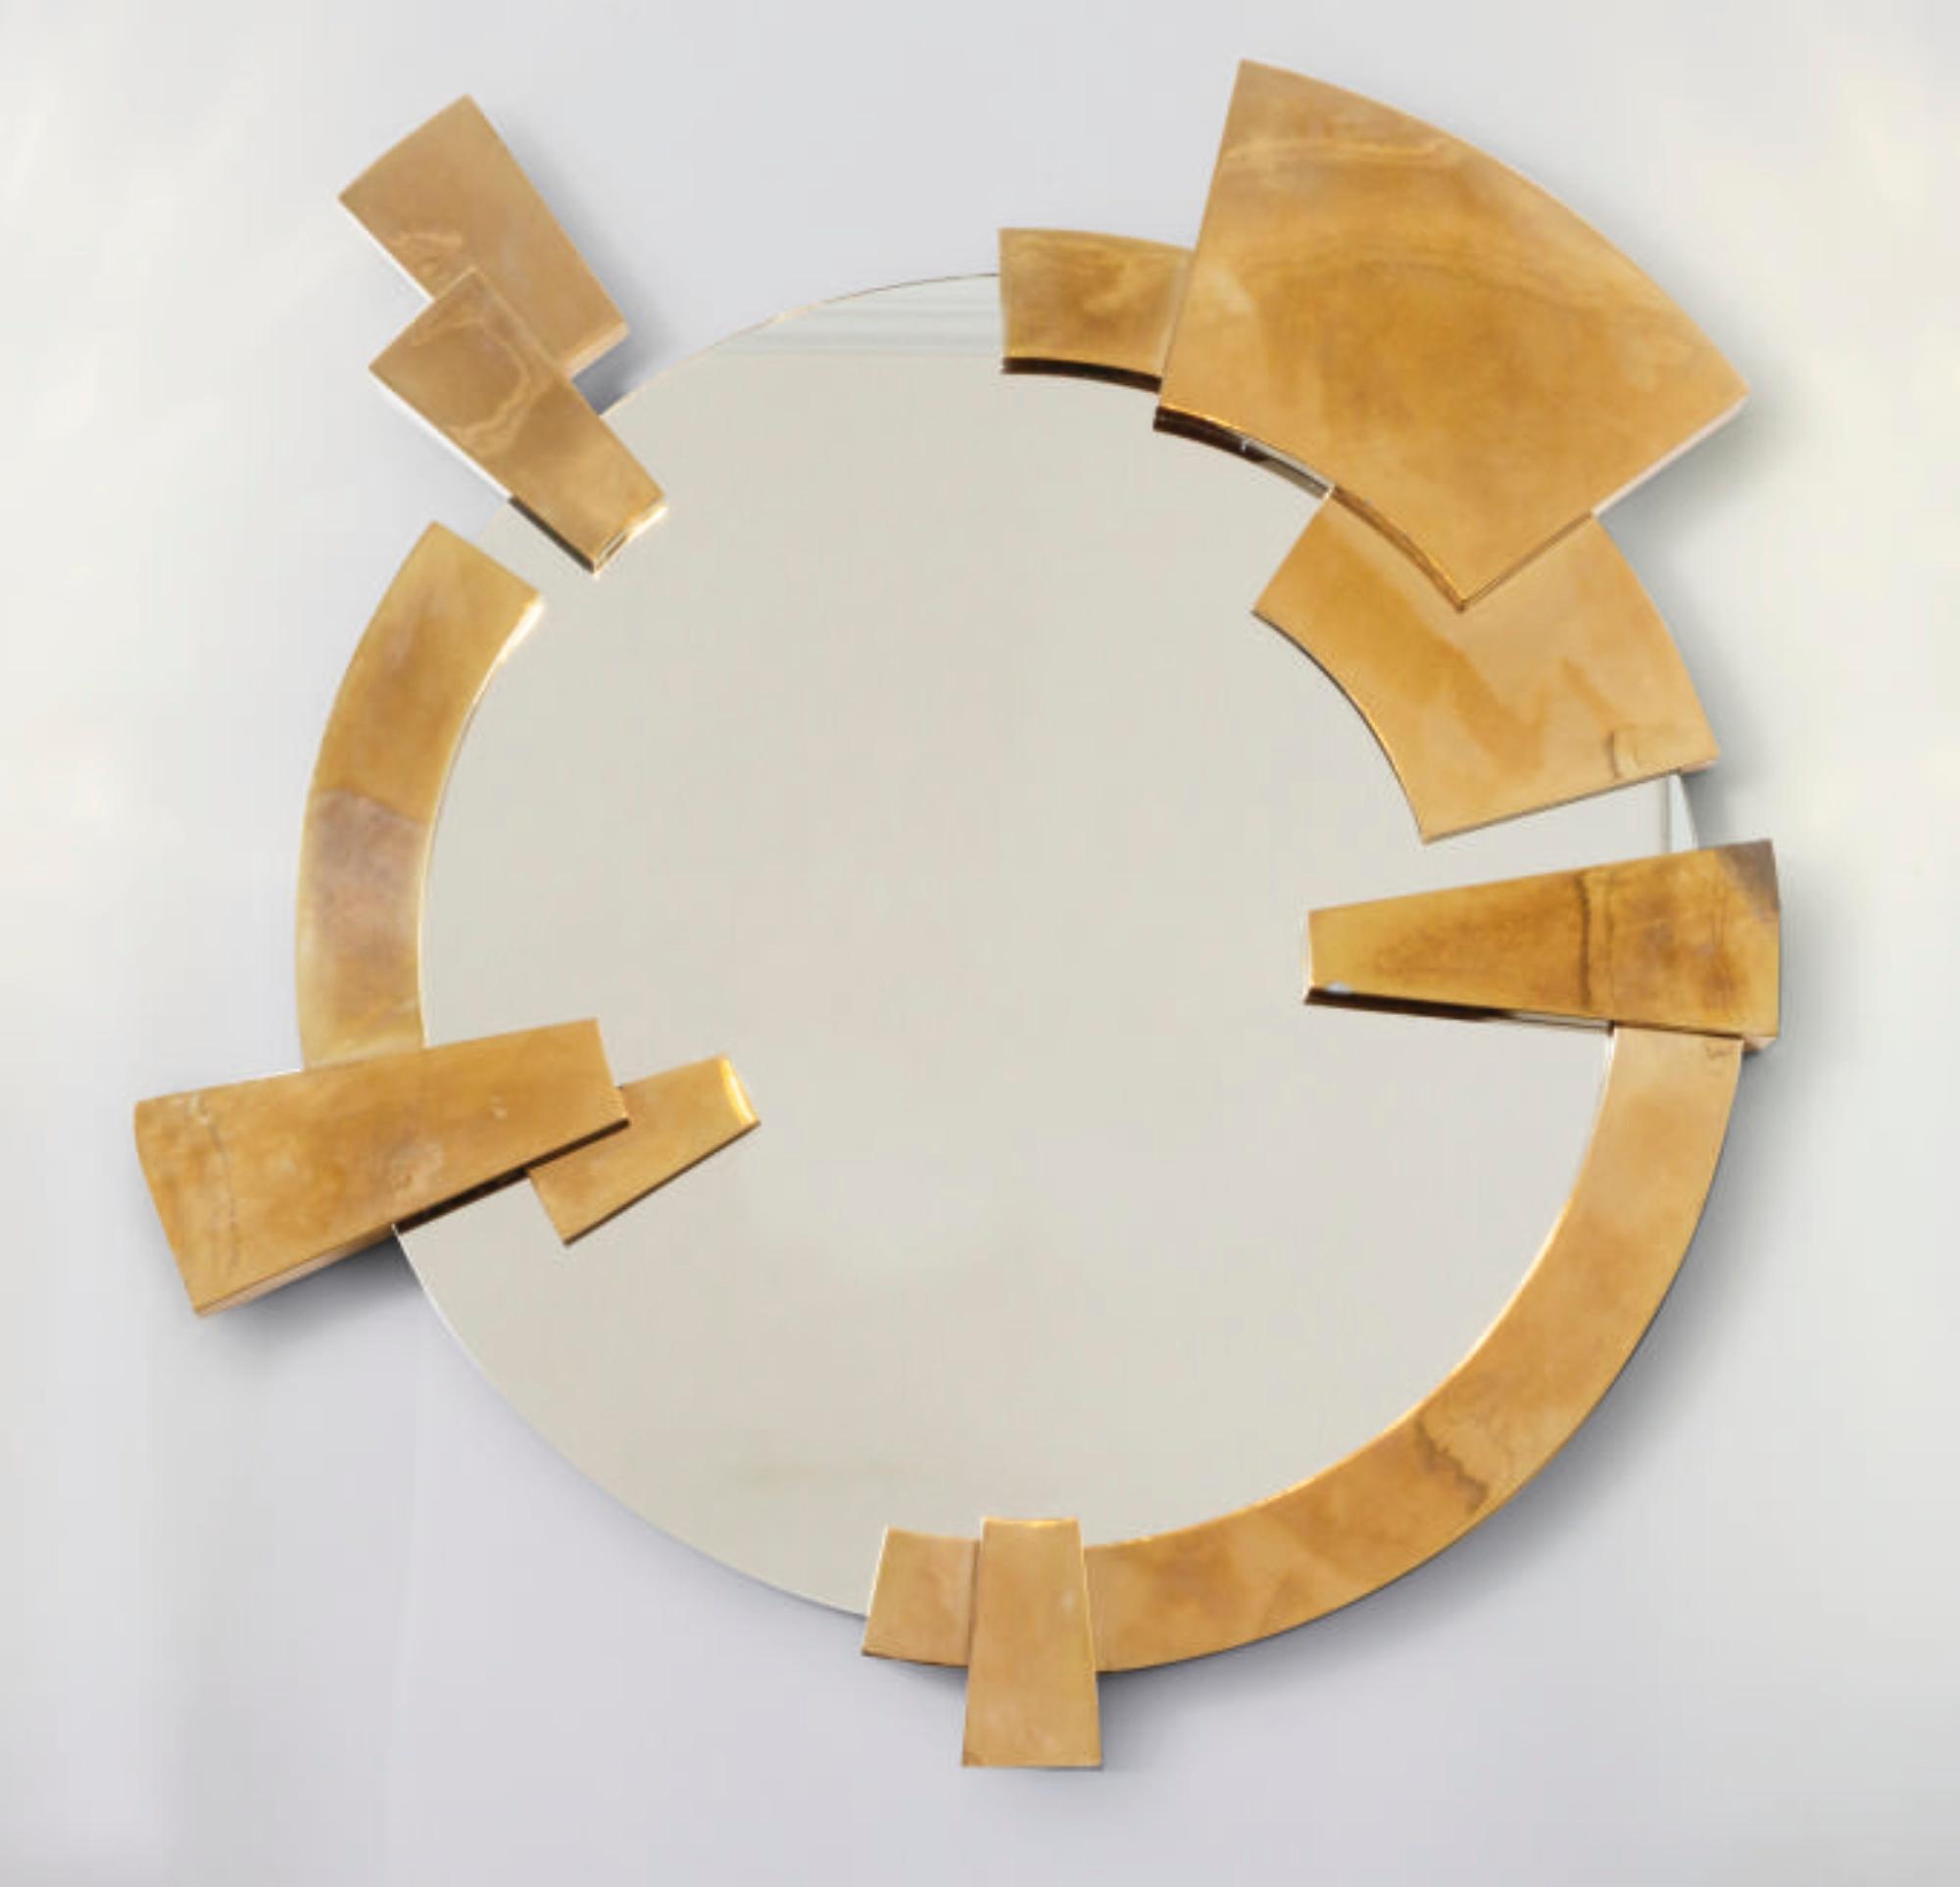 The best golden nickedpieces from Garrido's brothers garrido gallery New Garrido Gallery's Collectible Designs at The Salon Art+Design Mirror2